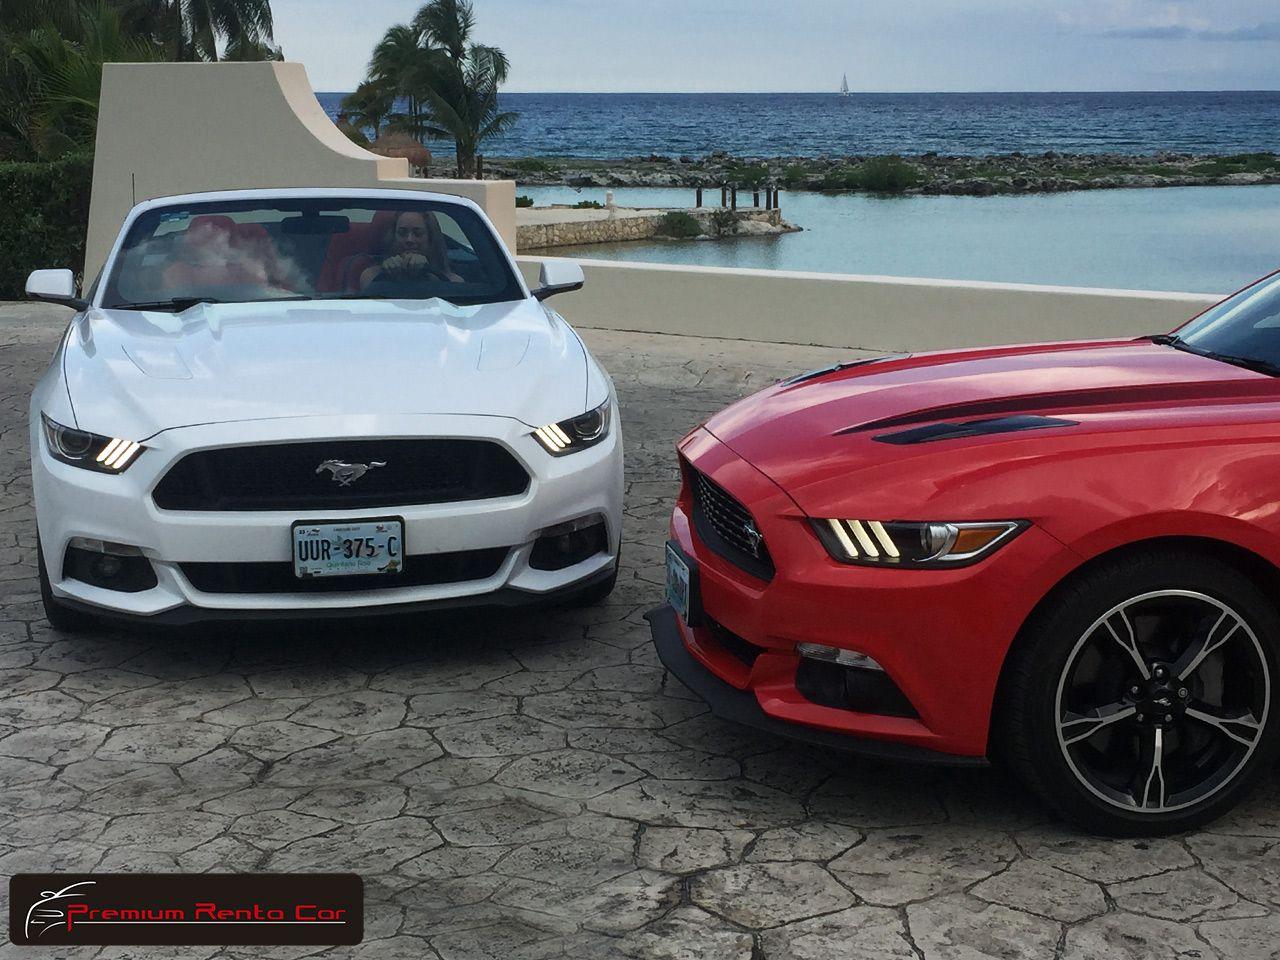 Ford Mustang Gt Cs California Special Convertible 2016 Color 2015 Rojo Racing